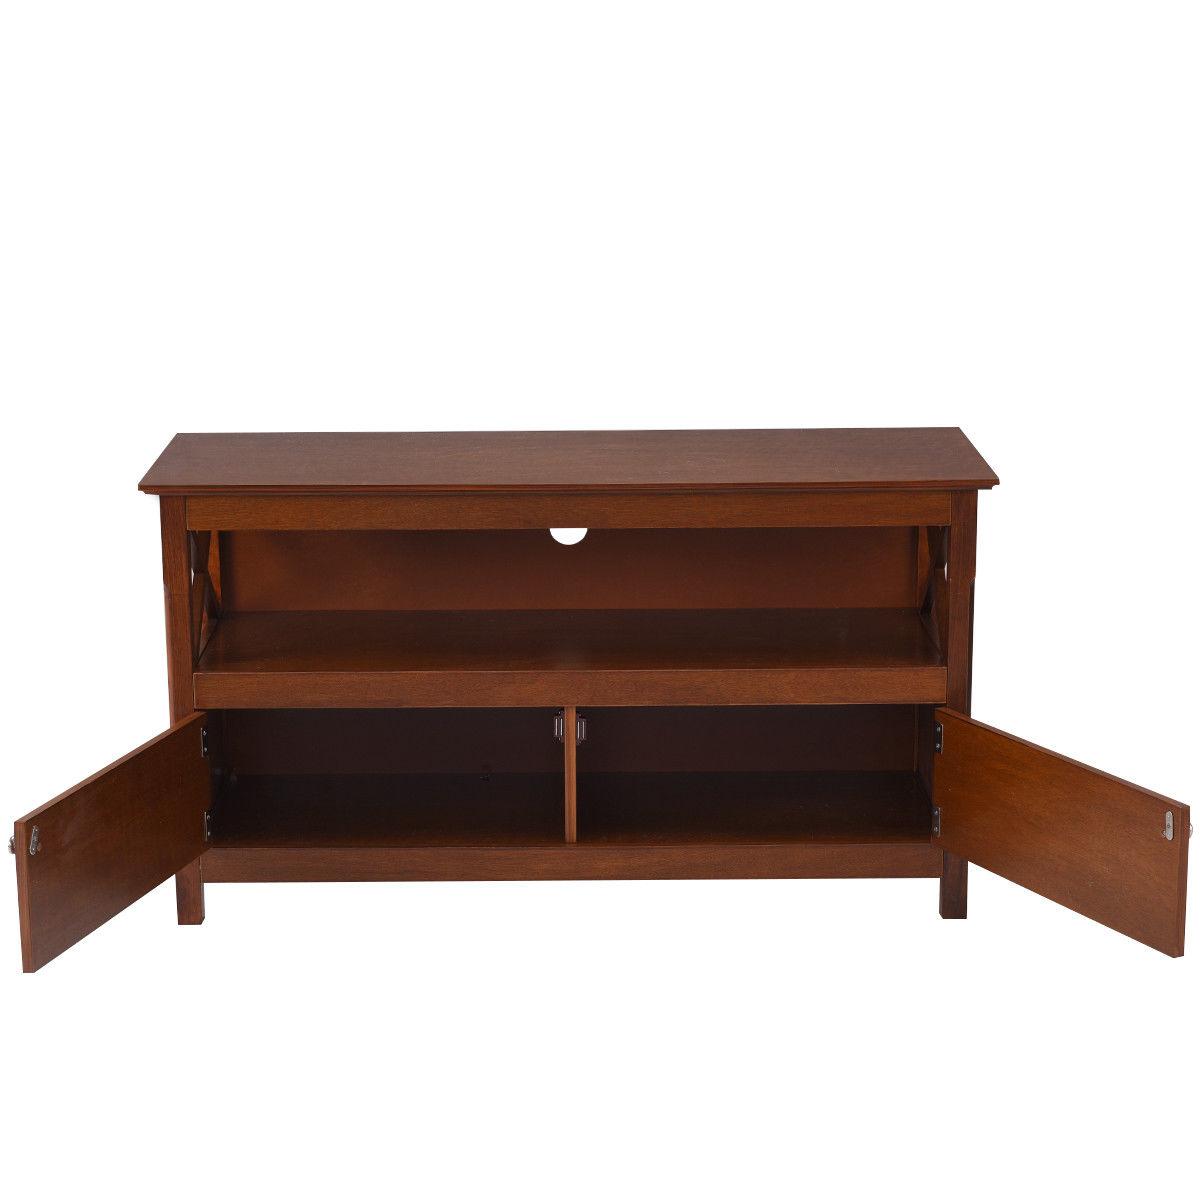 "44"" TV Stand Console Wooden Storage Cabinet Shelf Media Center Stand - image 6 de 9"